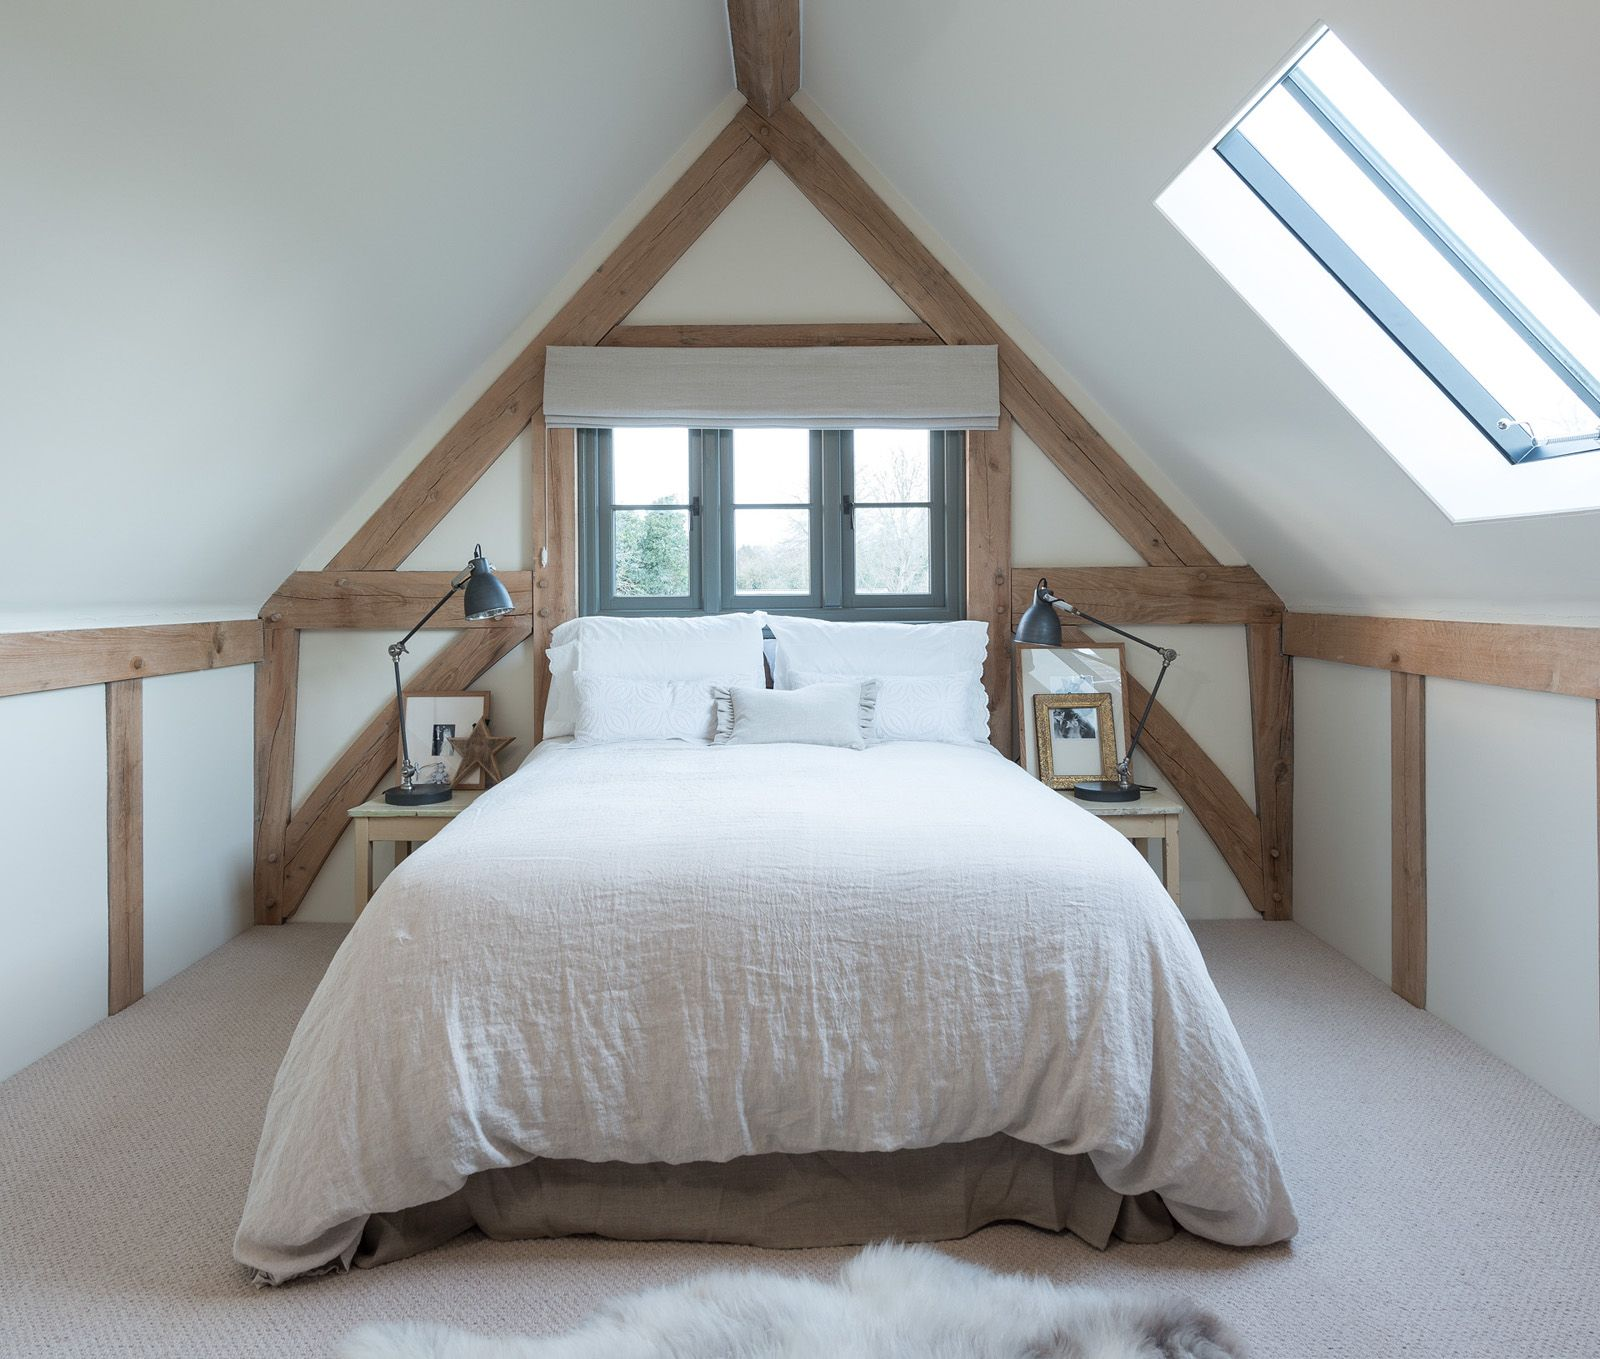 Show House Bedroom Ideas: Border Oak Show House Master Bedroom